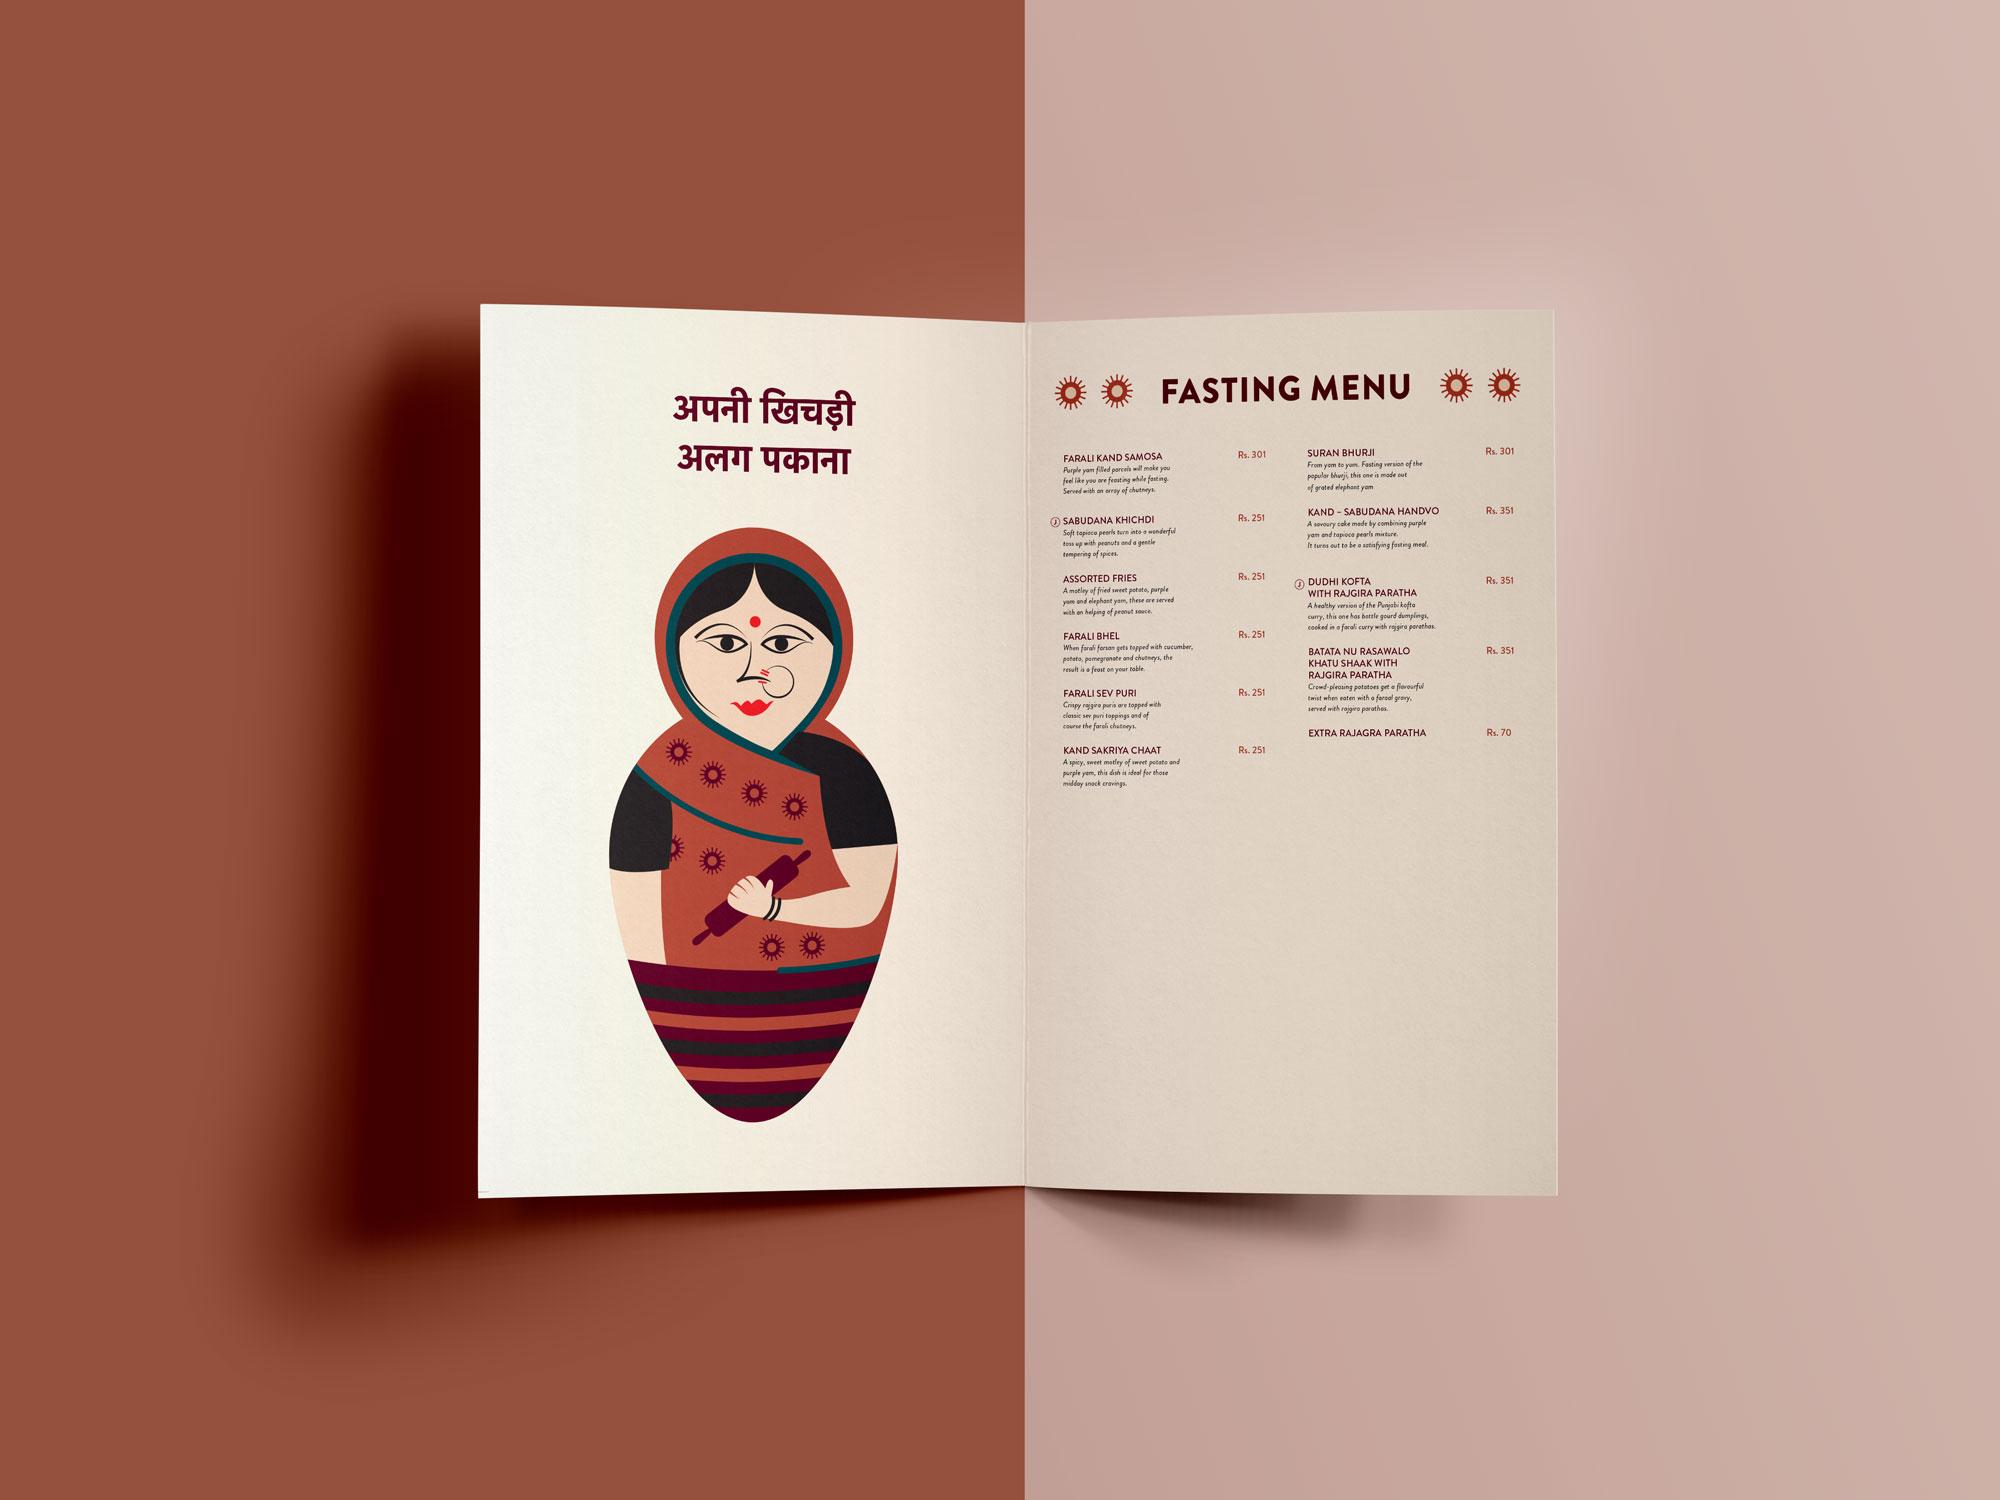 fasting-menu-page